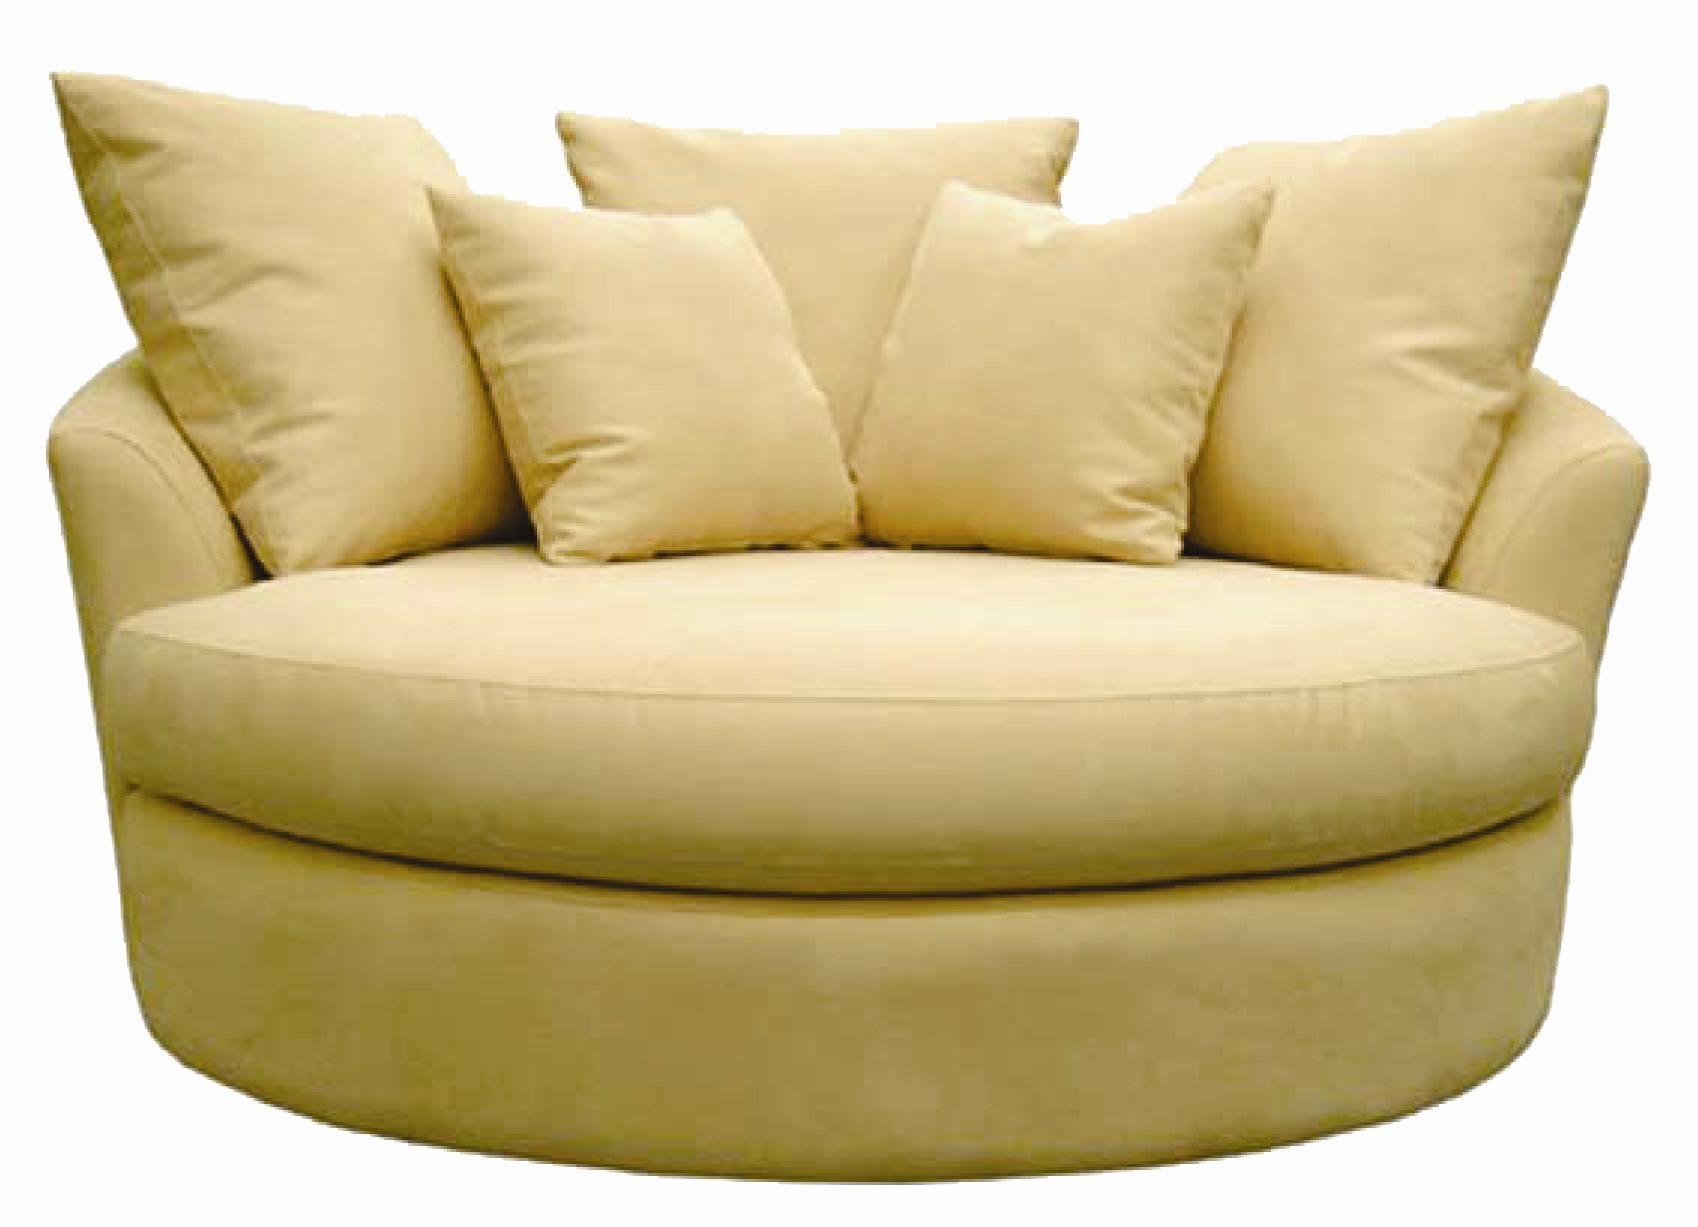 15 Ideas of Round Swivel Sofa Chairs | Sofa Ideas